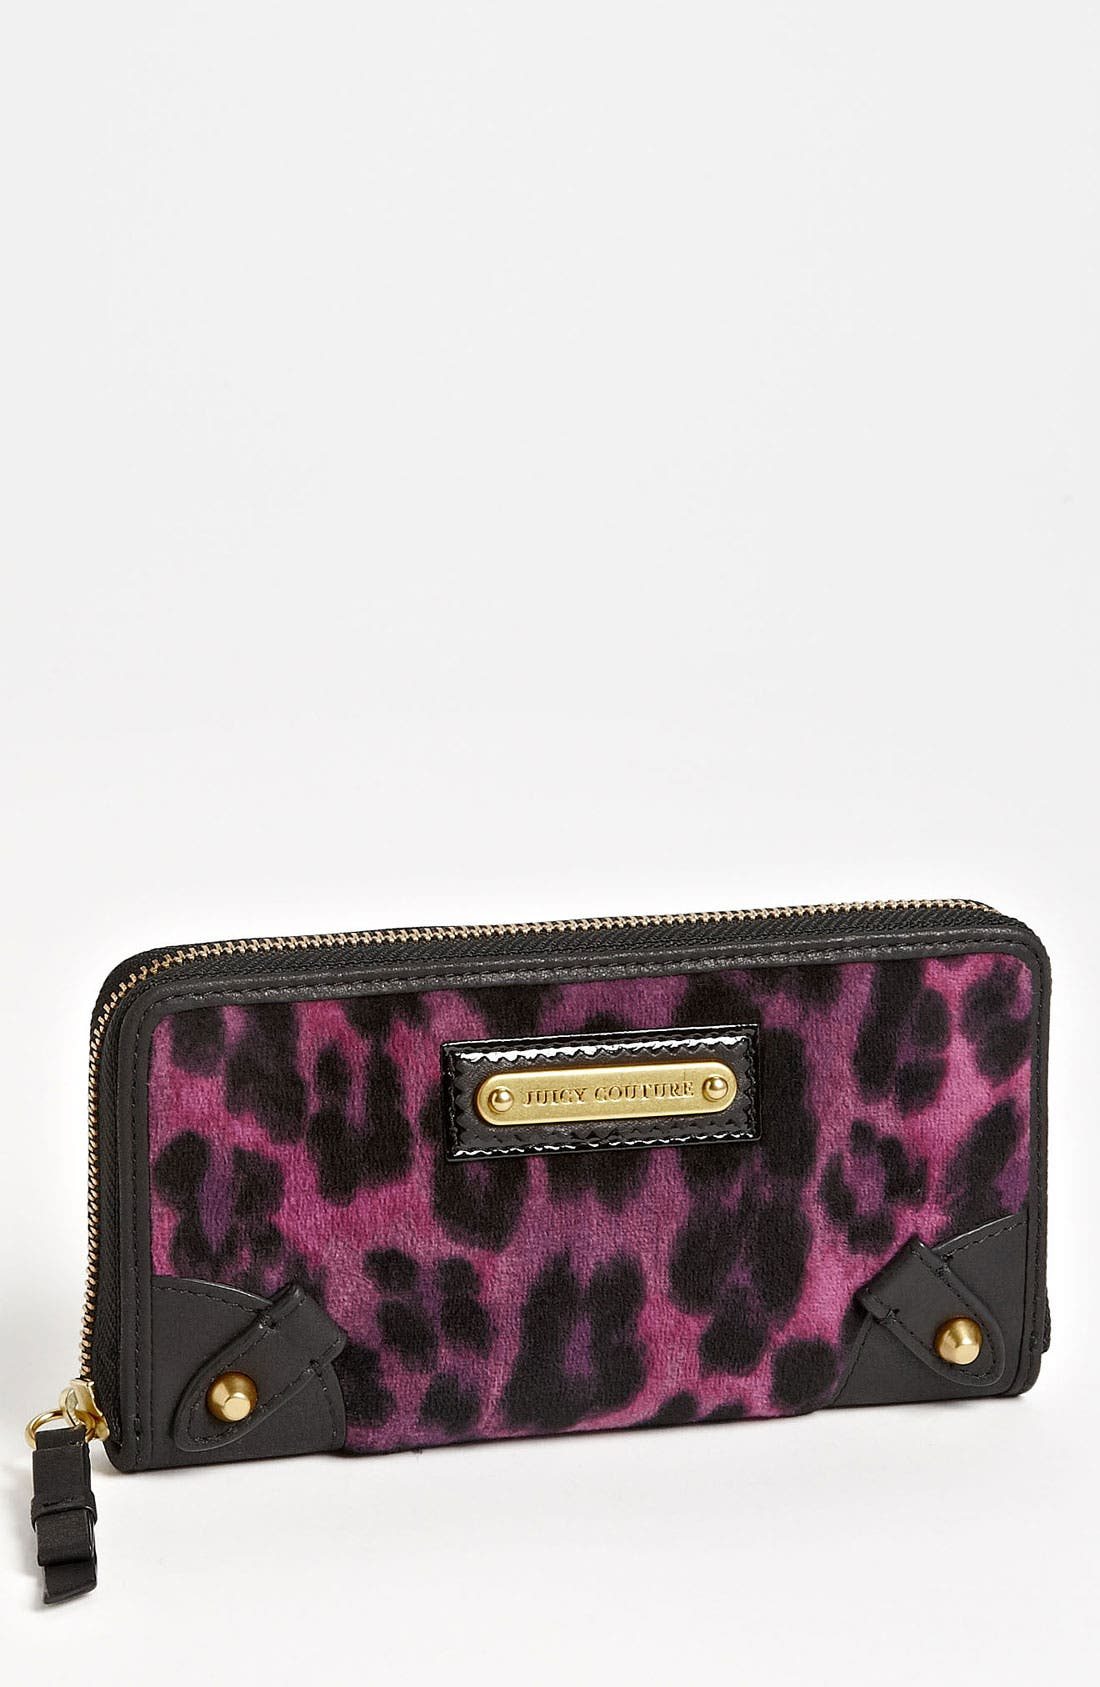 Alternate Image 1 Selected - Juicy Couture 'Wild Things' Zip Wallet